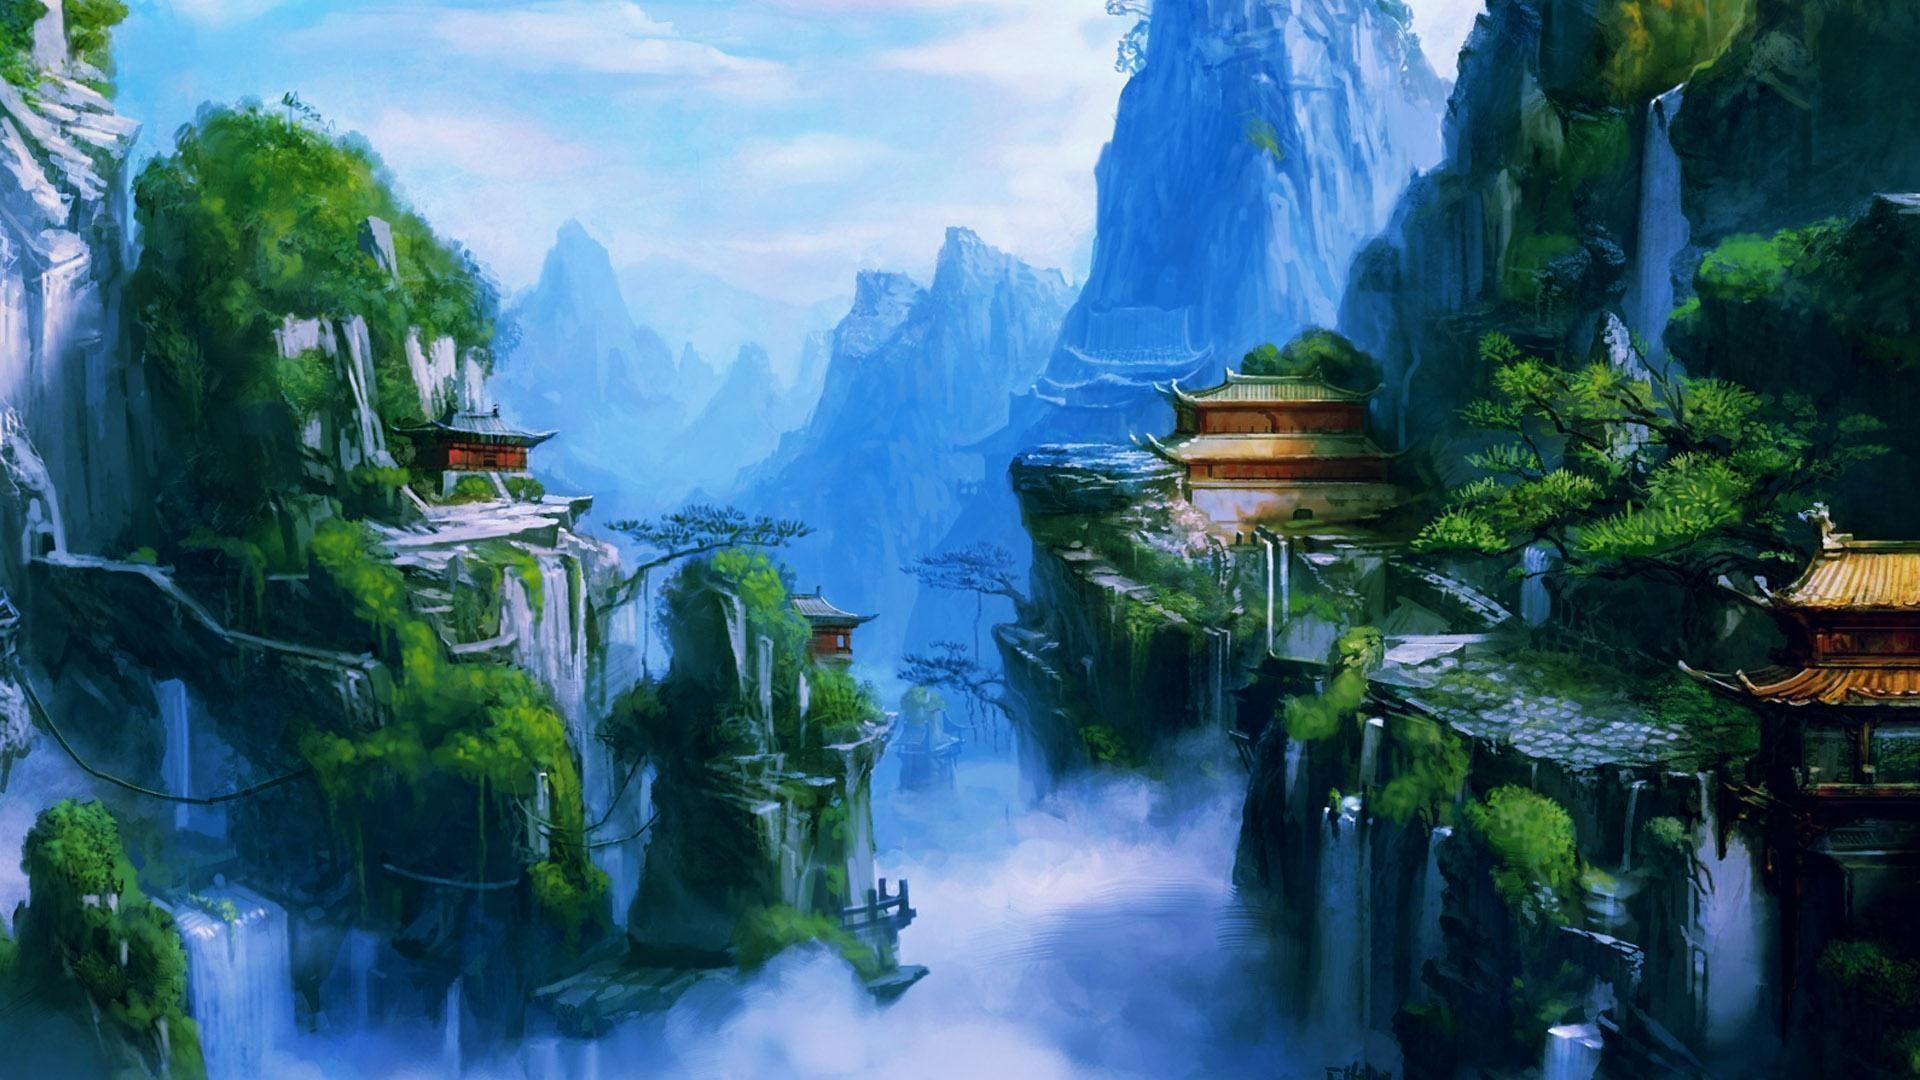 wallpaper.wiki-anime-fantasy-landscape-wallpaper-PIC-WPB002777